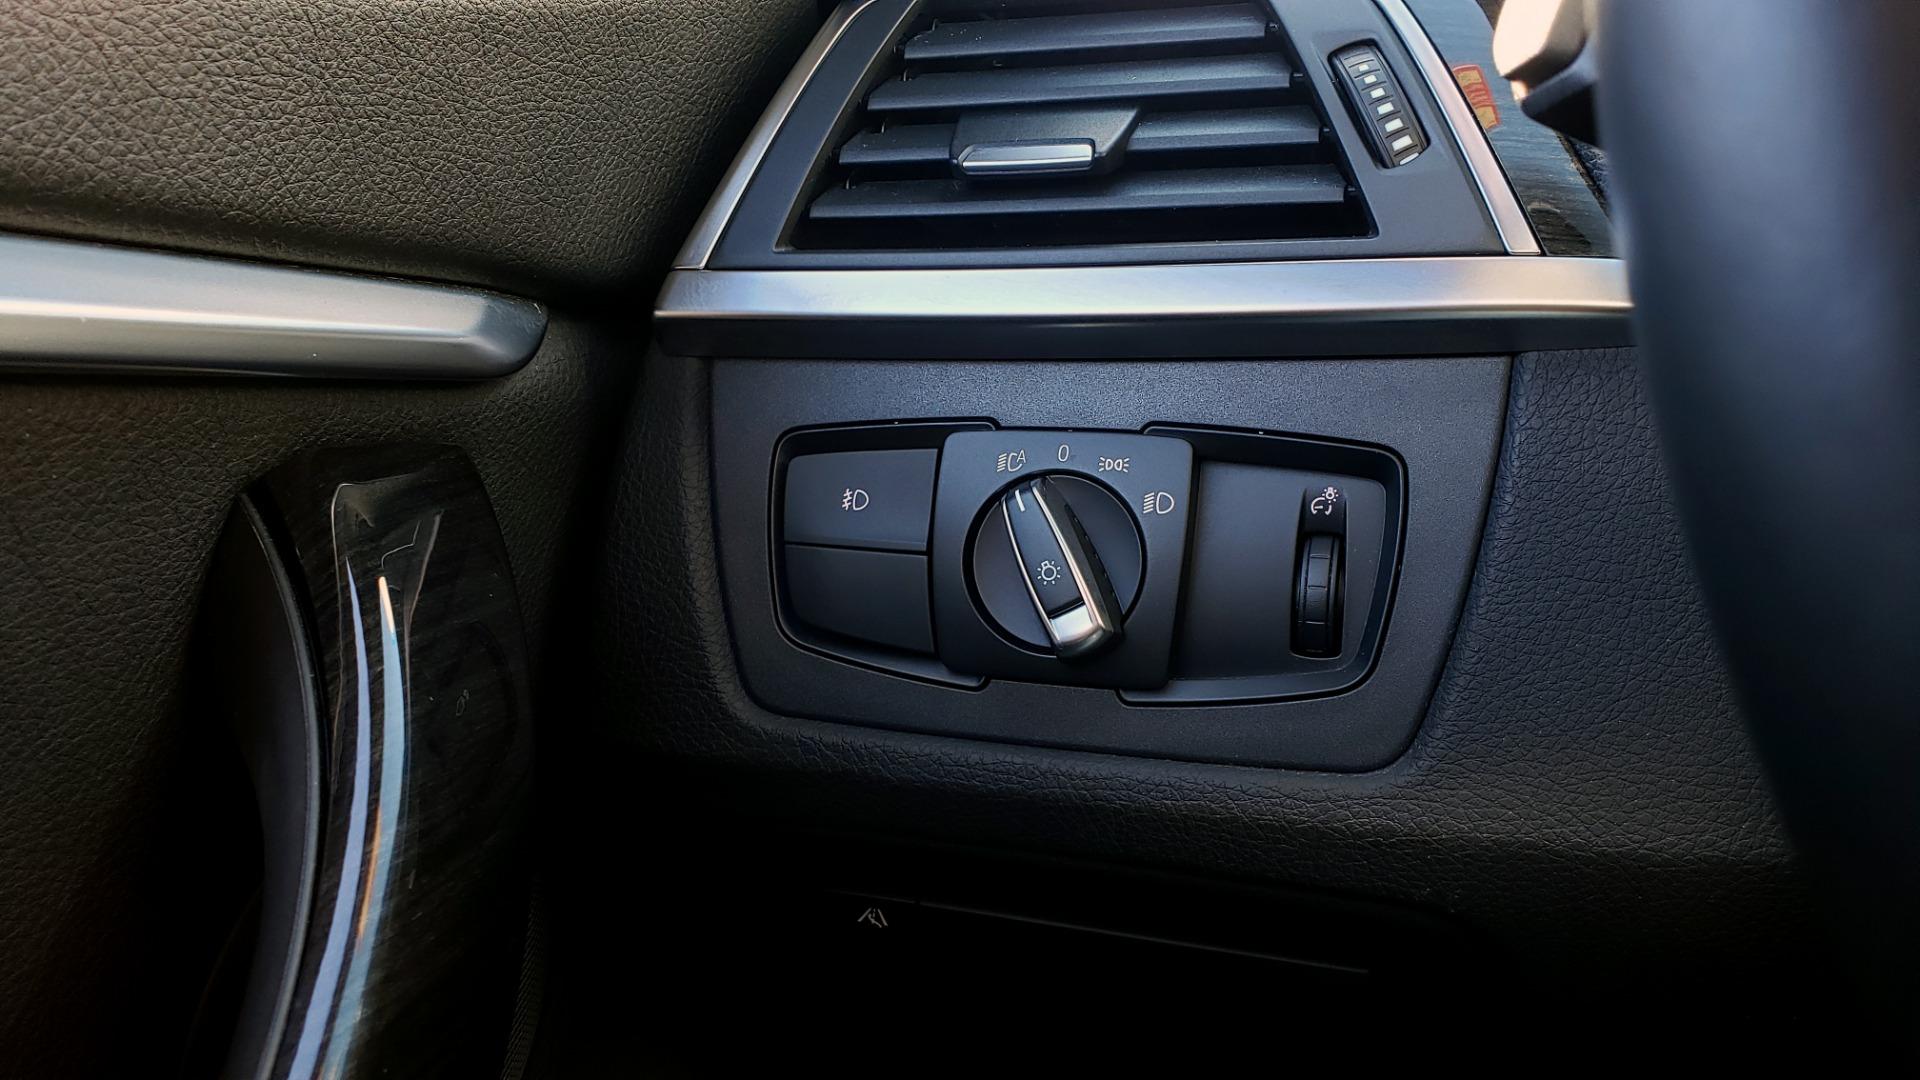 Used 2018 BMW 4 SERIES 430IXDRIVE / PREMIUM / NAV / SUNROOF / ESSENTIALS PKG for sale $28,995 at Formula Imports in Charlotte NC 28227 38